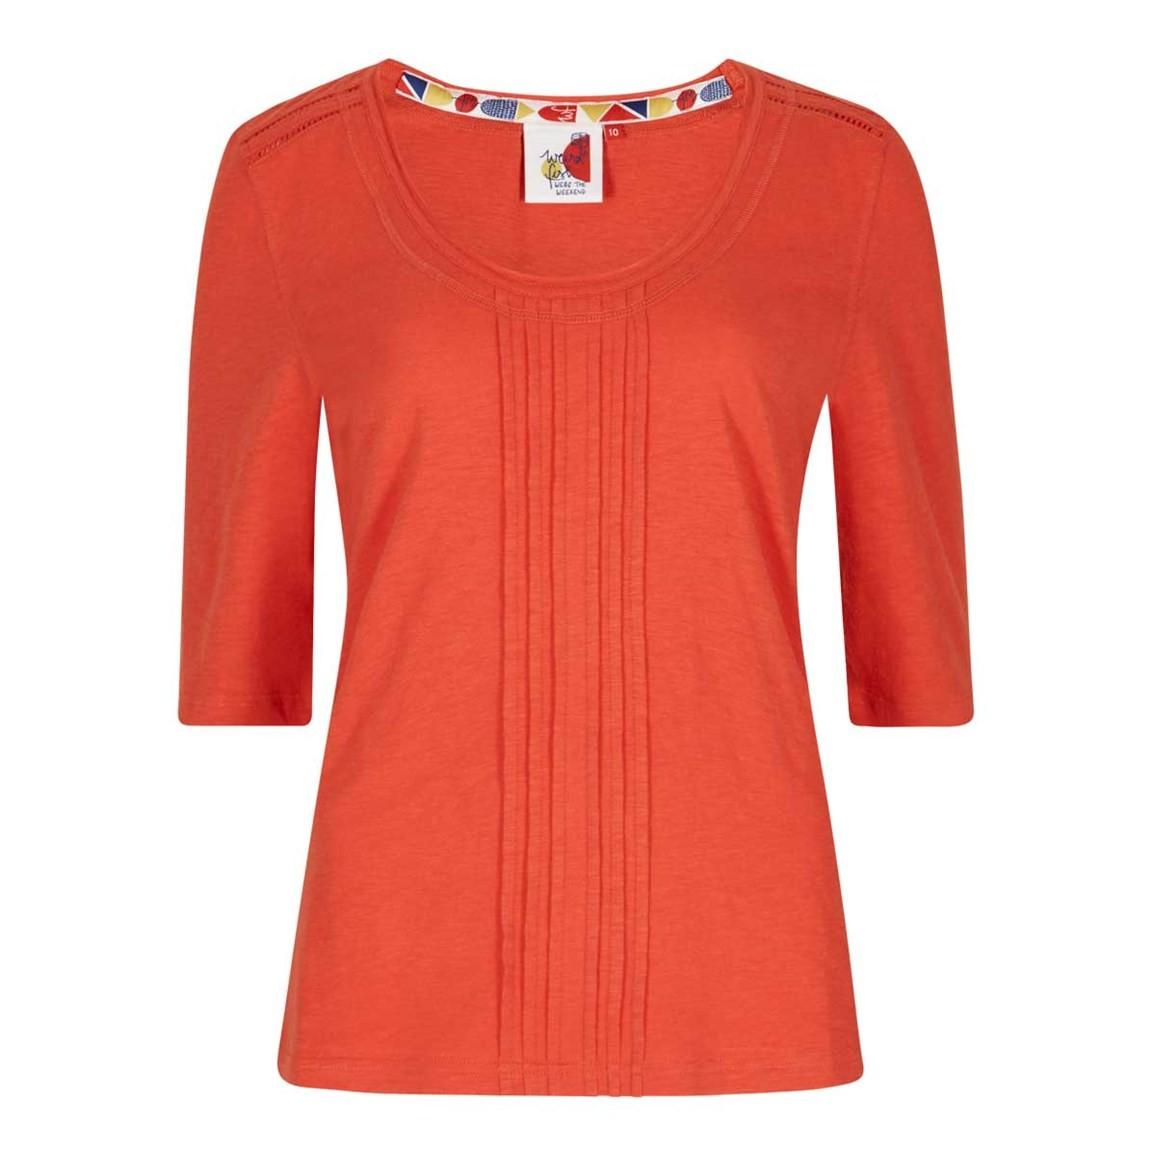 Weird Fish Santana Slub Jersey Outfitter T-Shirt Tango Red Size 10